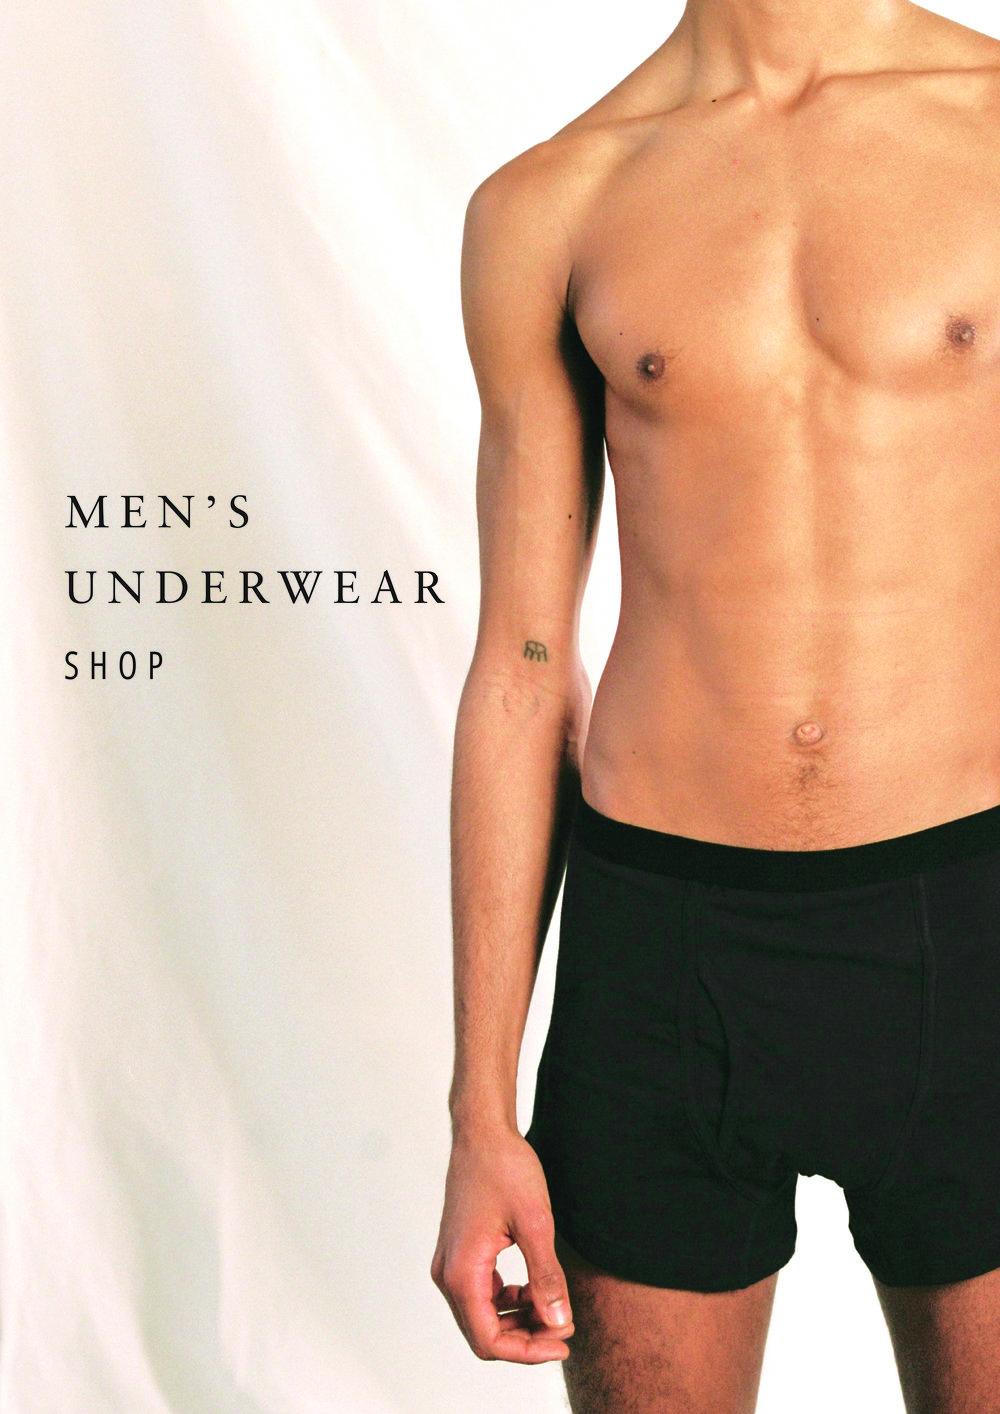 men shop.jpg